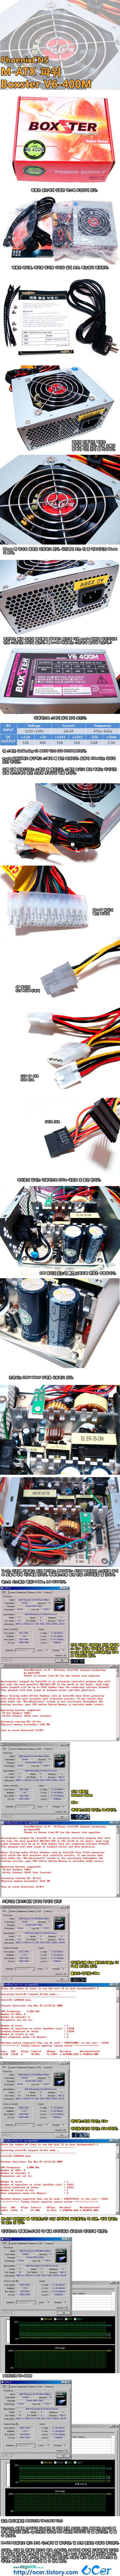 DC파워서플라이, 전원공급기, 파워서플라이가격, PC파워서플라이, 파워서플라이추천, 멀티미터중고파워서플라이, 컴퓨터파워서플라이, 파워서플라이테스트, 전원공급장치, AC파워서플라이멀티테스터, 파워서플라이수리, 파워서플라이종류, 파워서플라이600W, 파워서플라이소음, 파워서플라이교체, 파워서플라이사용법, 인버터, power, 컴퓨터부품, pc부품, PC, pc리뷰, IT뉴스, IT리뷰, It, 타운리뷰, 리뷰, 이슈, ocer리뷰, pc하드웨어, 하드웨어 리뷰, 사진, OCER, 타운뉴스, 타운포토, [POWER/파워] 피닉스 CNS, [POWER/파워] 피닉스 CNS m-atx 파워 Boxster V6-400M,